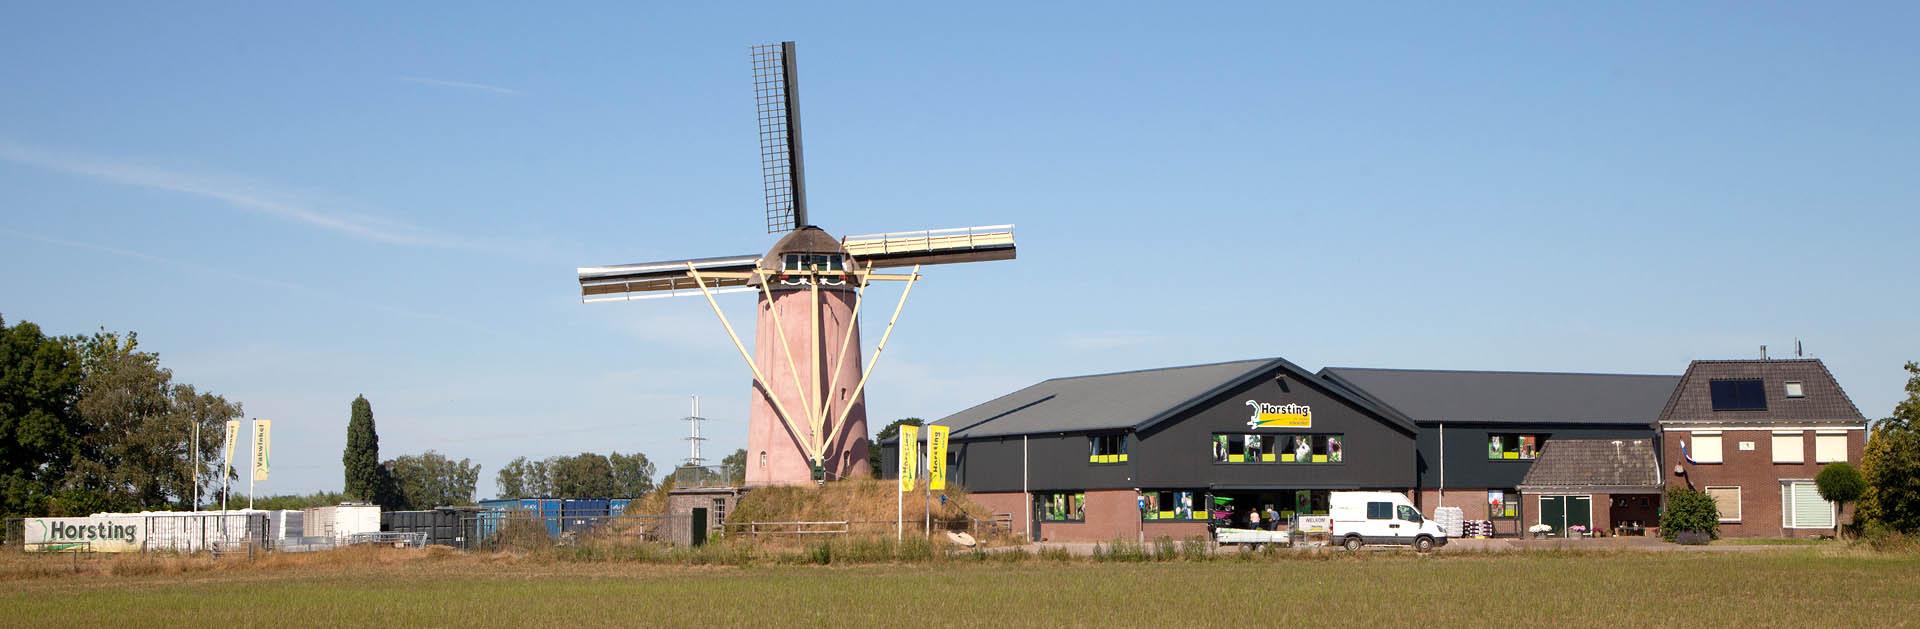 Rembrandt molen - Kilder